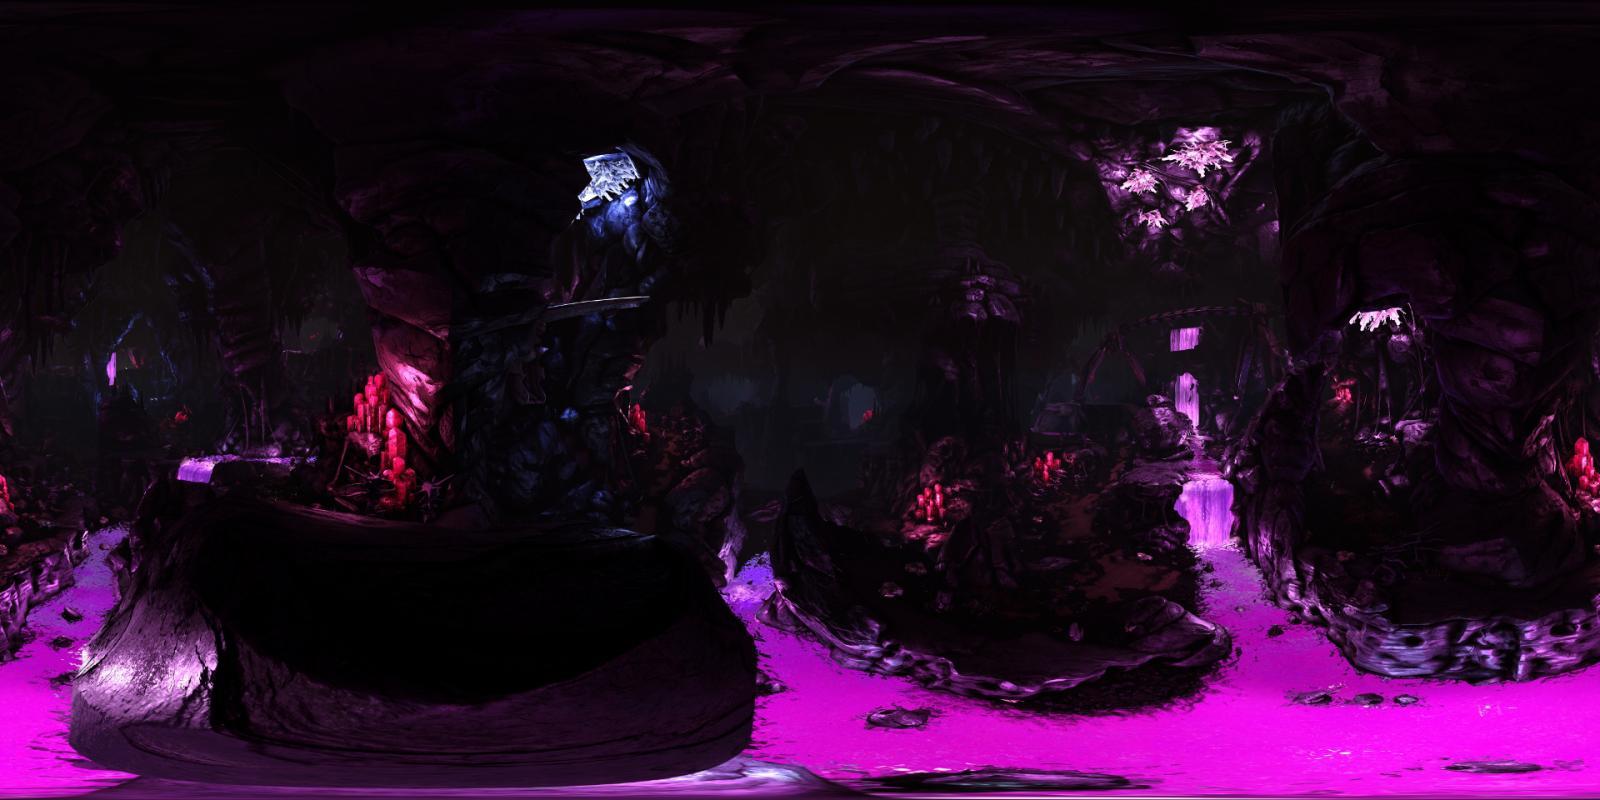 large.5a3da3edcecbf_WolfAngelus-NetherworldCaves-360.jpg